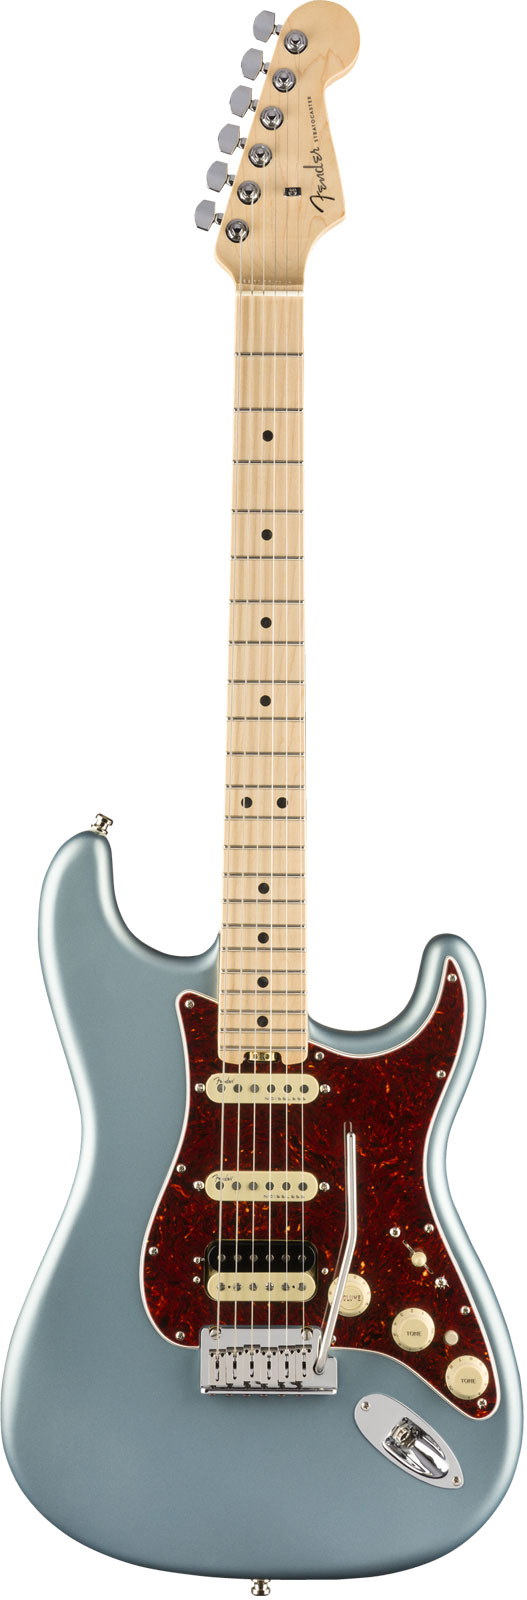 Fender American Elite Stratocaster Hss Shawbucker Mn Satin Ice Blue Metallic